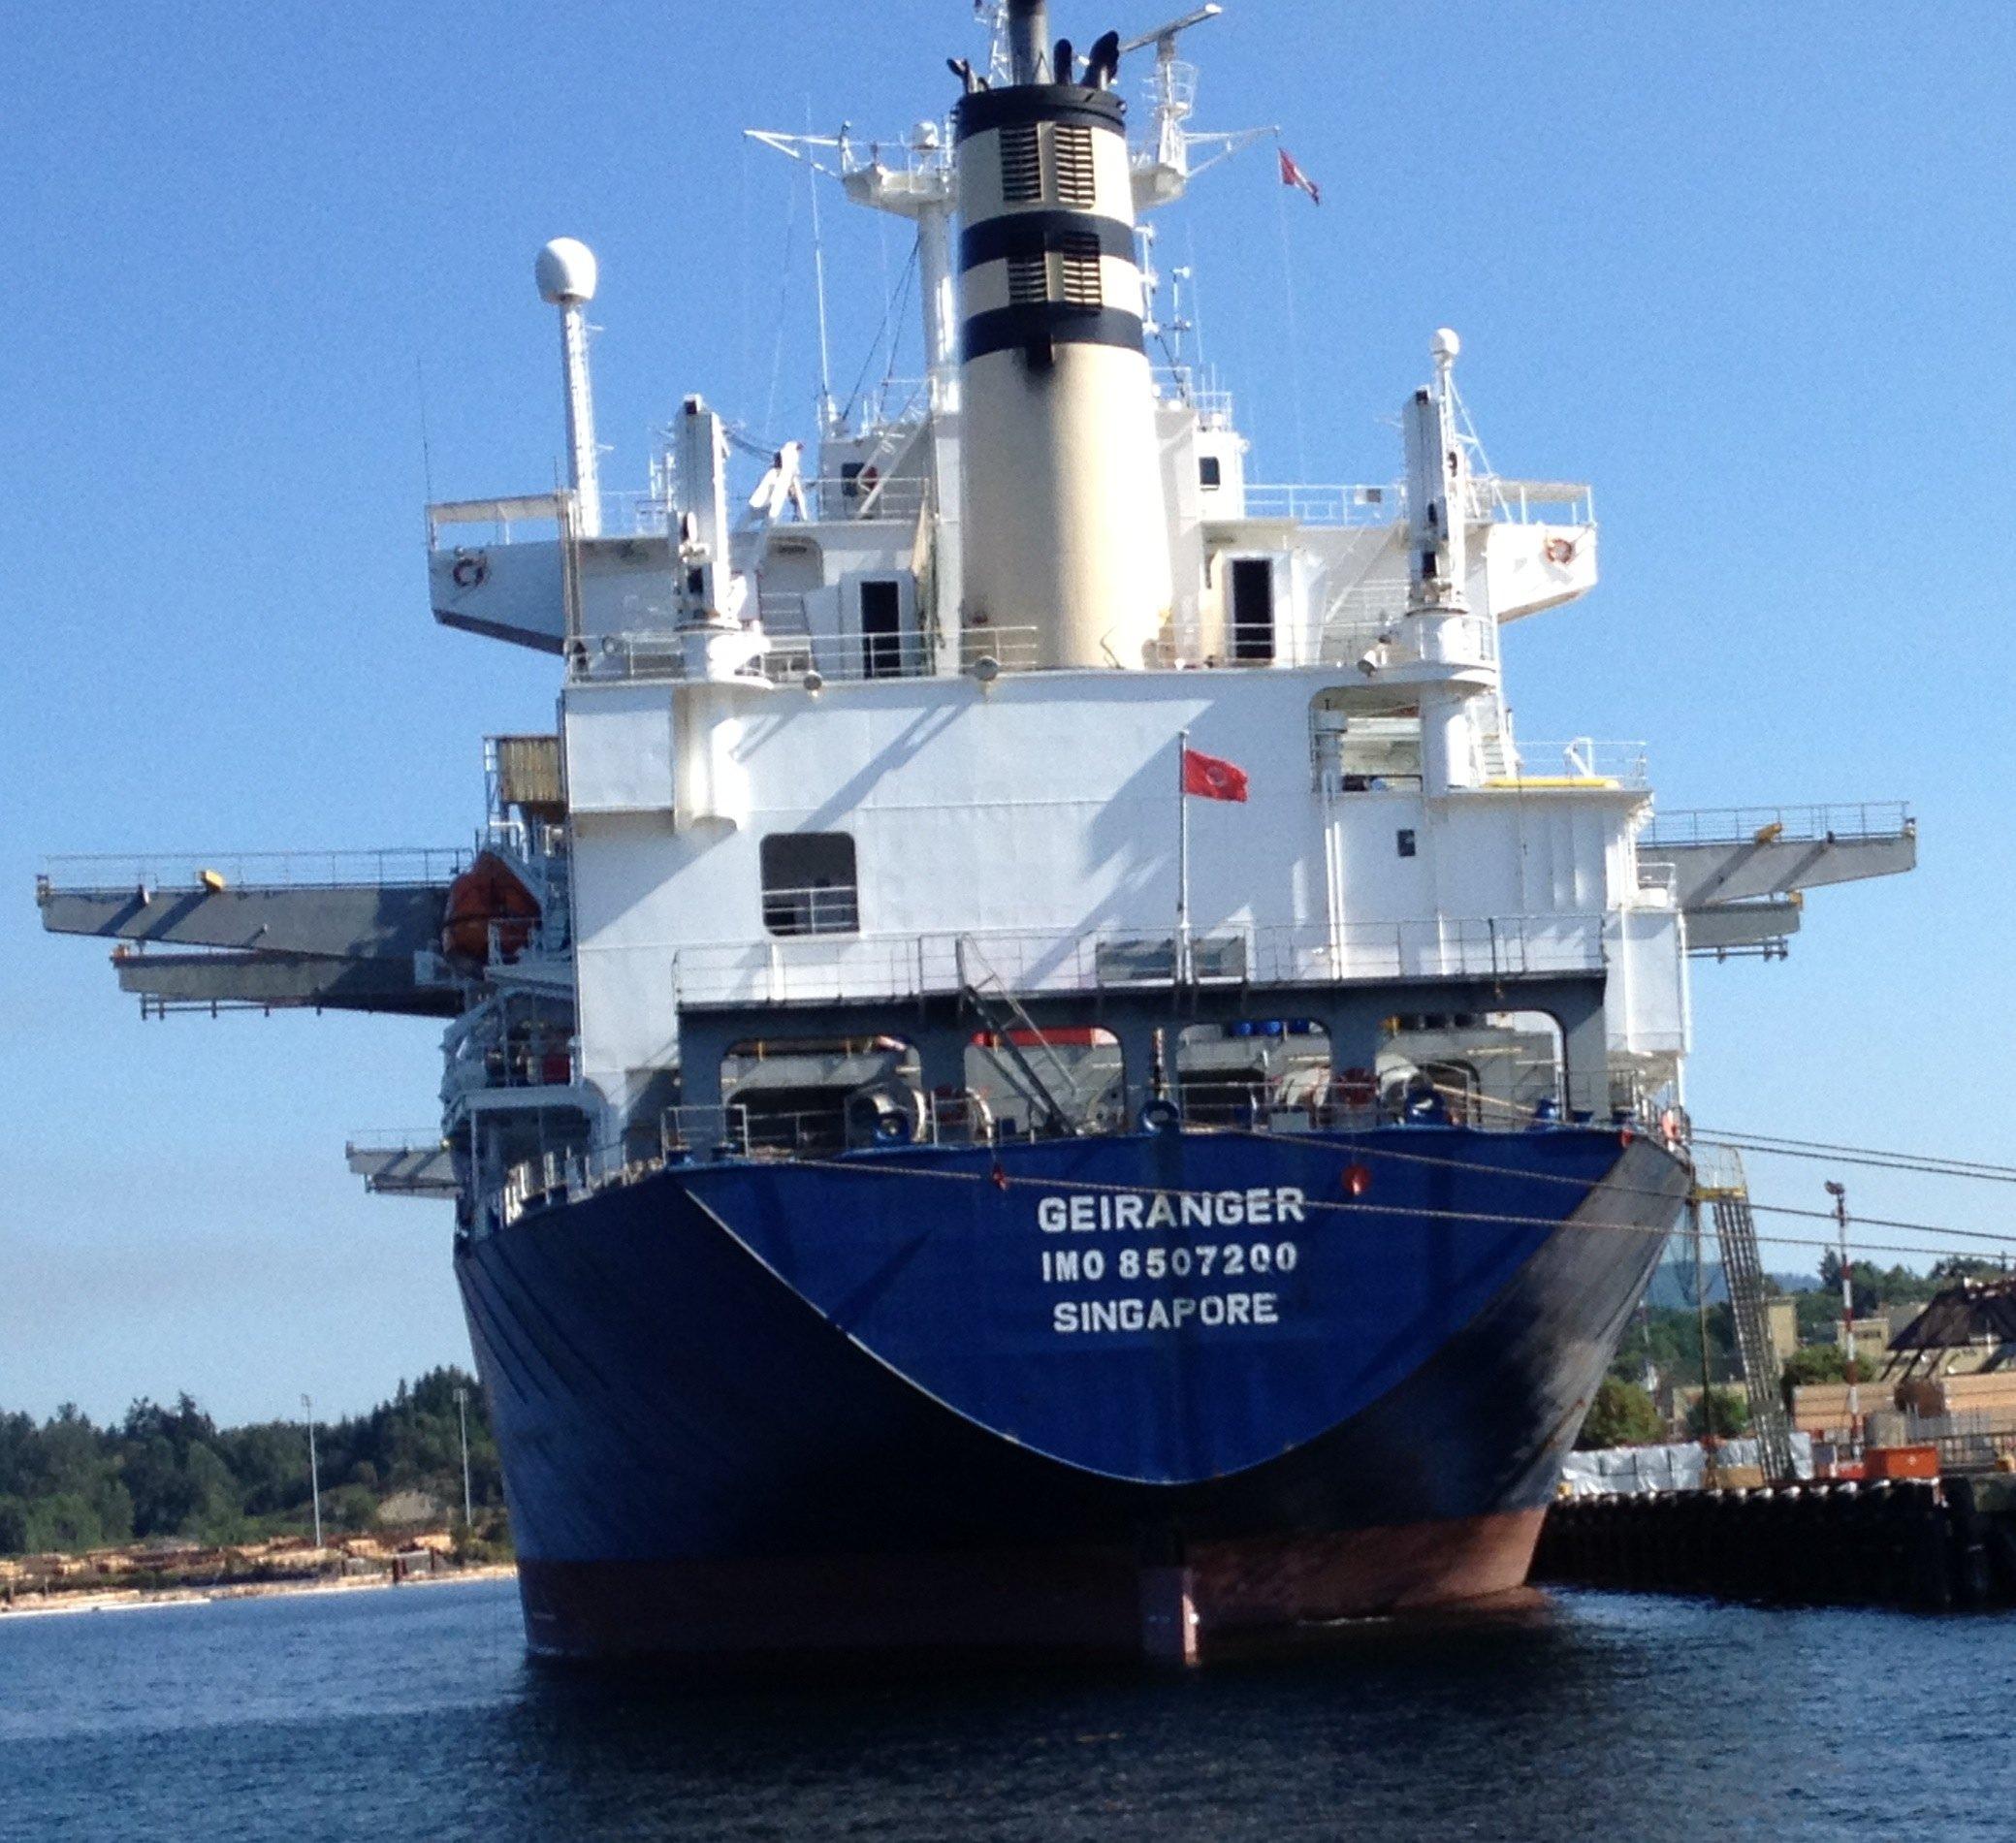 Maritime Transport Emissions ~ Shipping Matters Blog